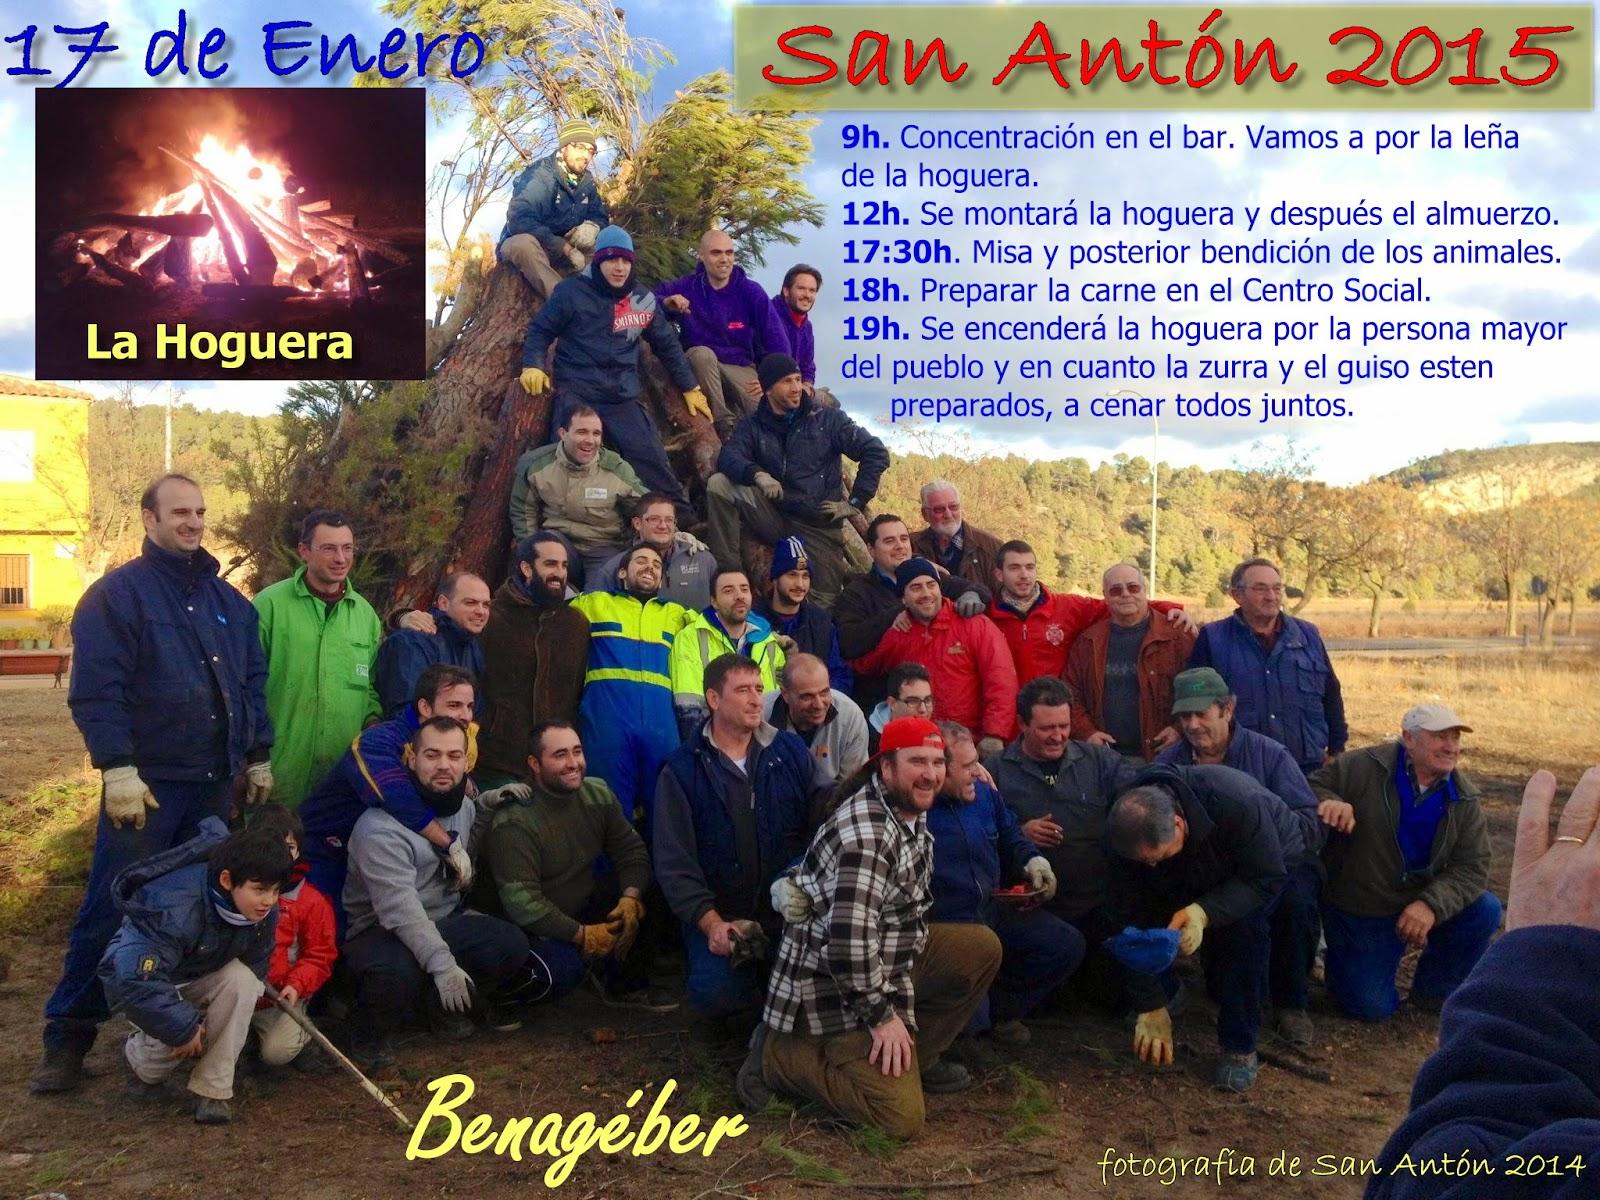 San Anton en Benageber 2014